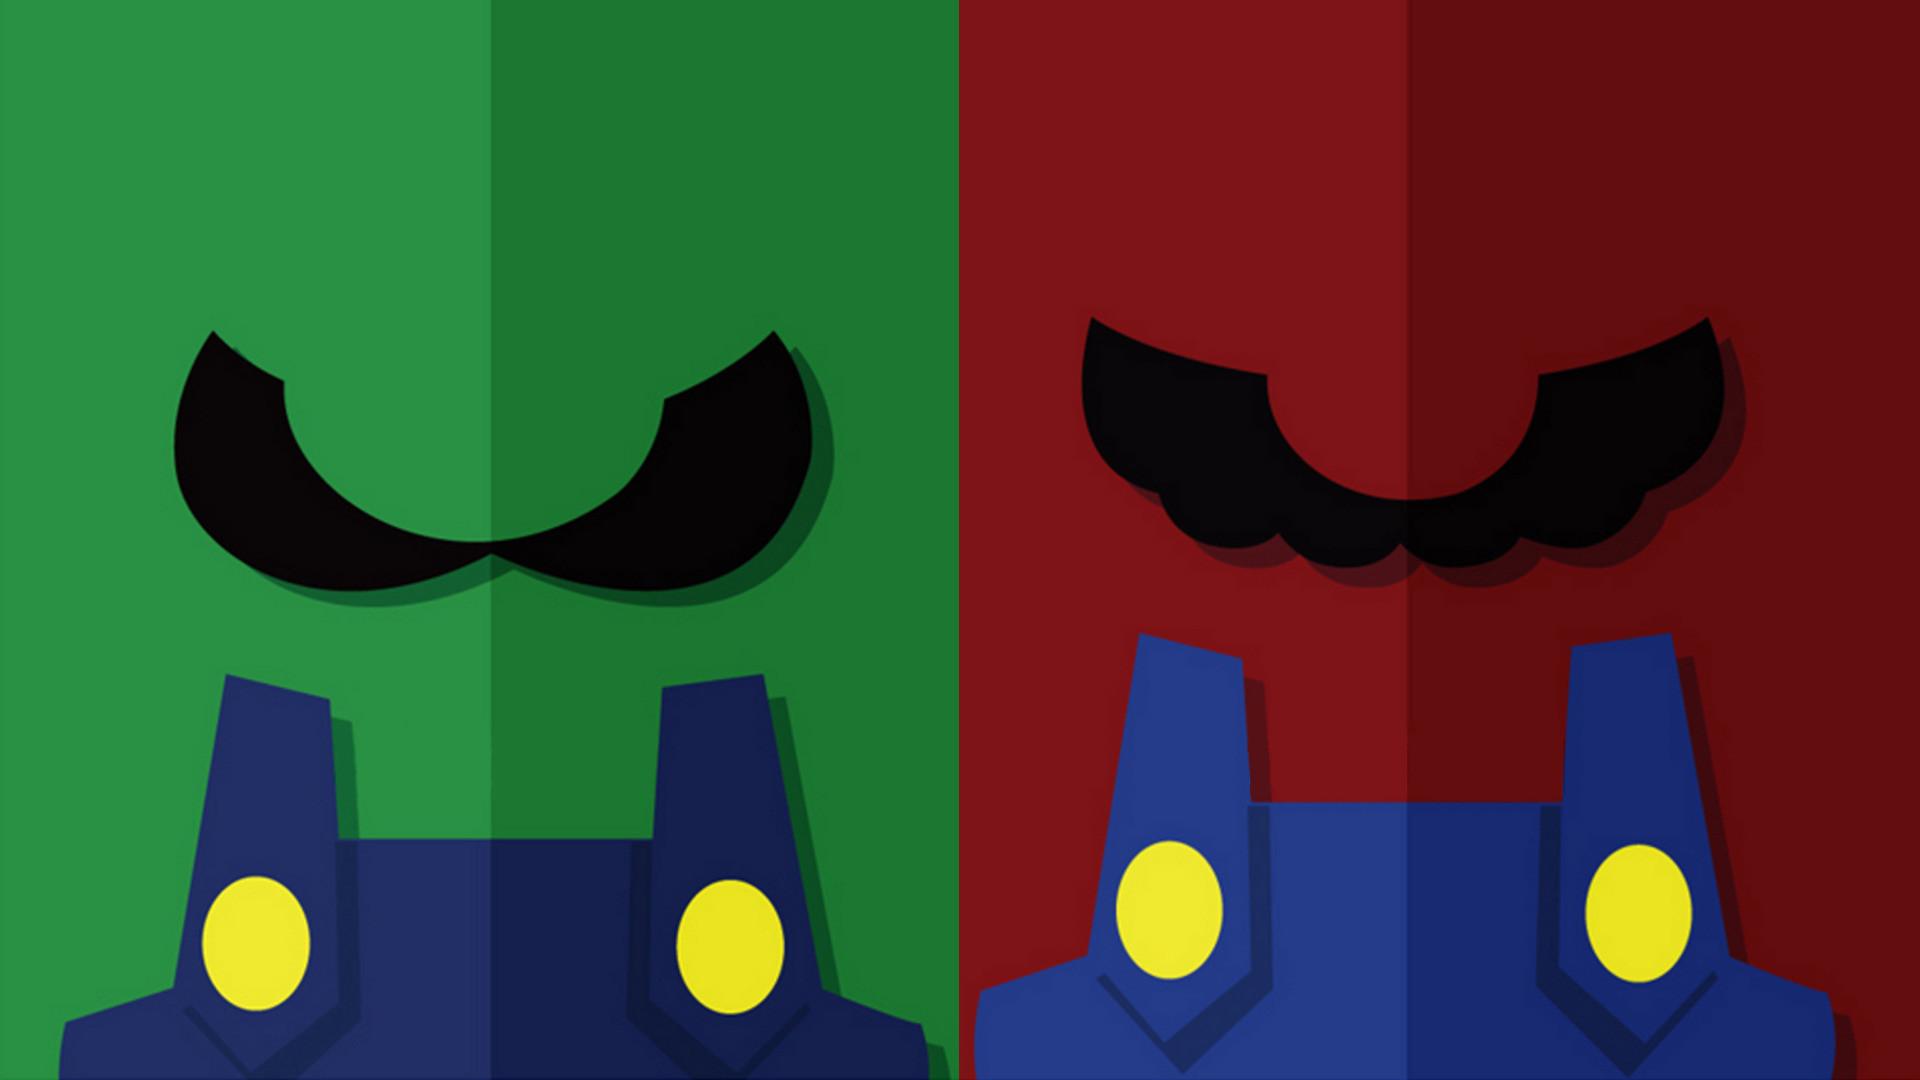 video Games, Super Mario, Mario Bros., Super Mario Bros., Luigi Wallpapers  HD / Desktop and Mobile Backgrounds